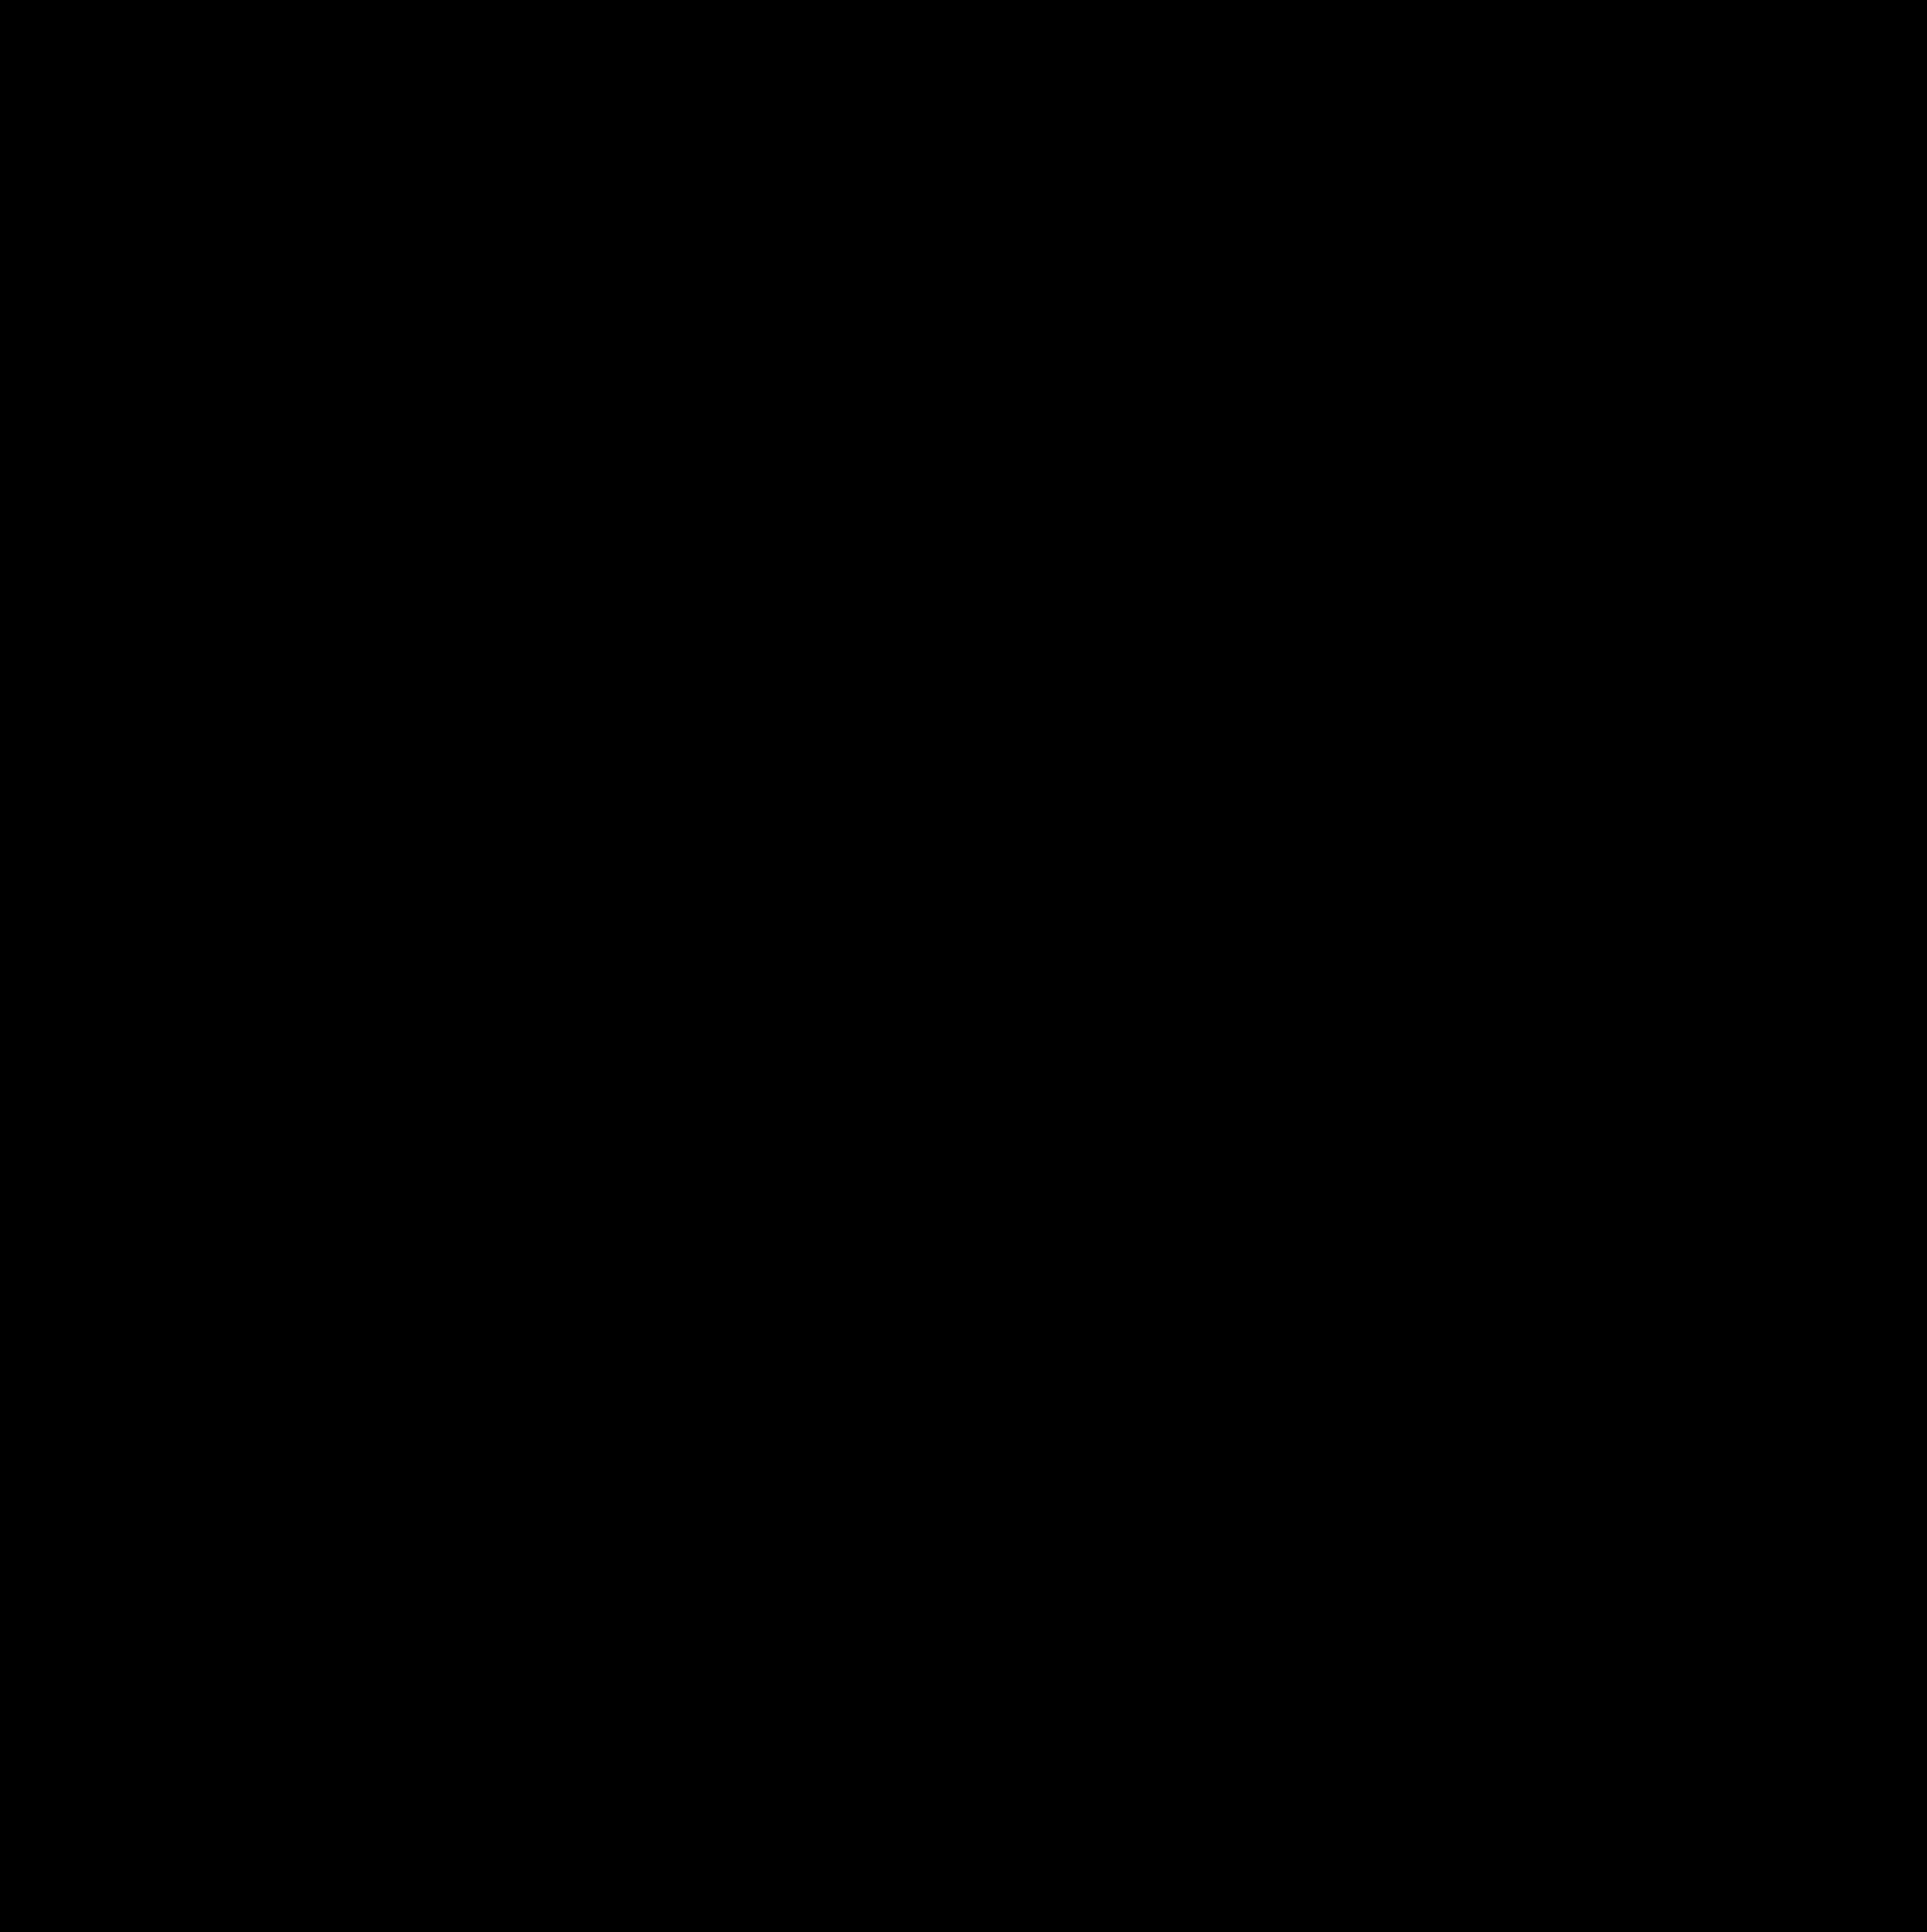 Vinci Brian logo